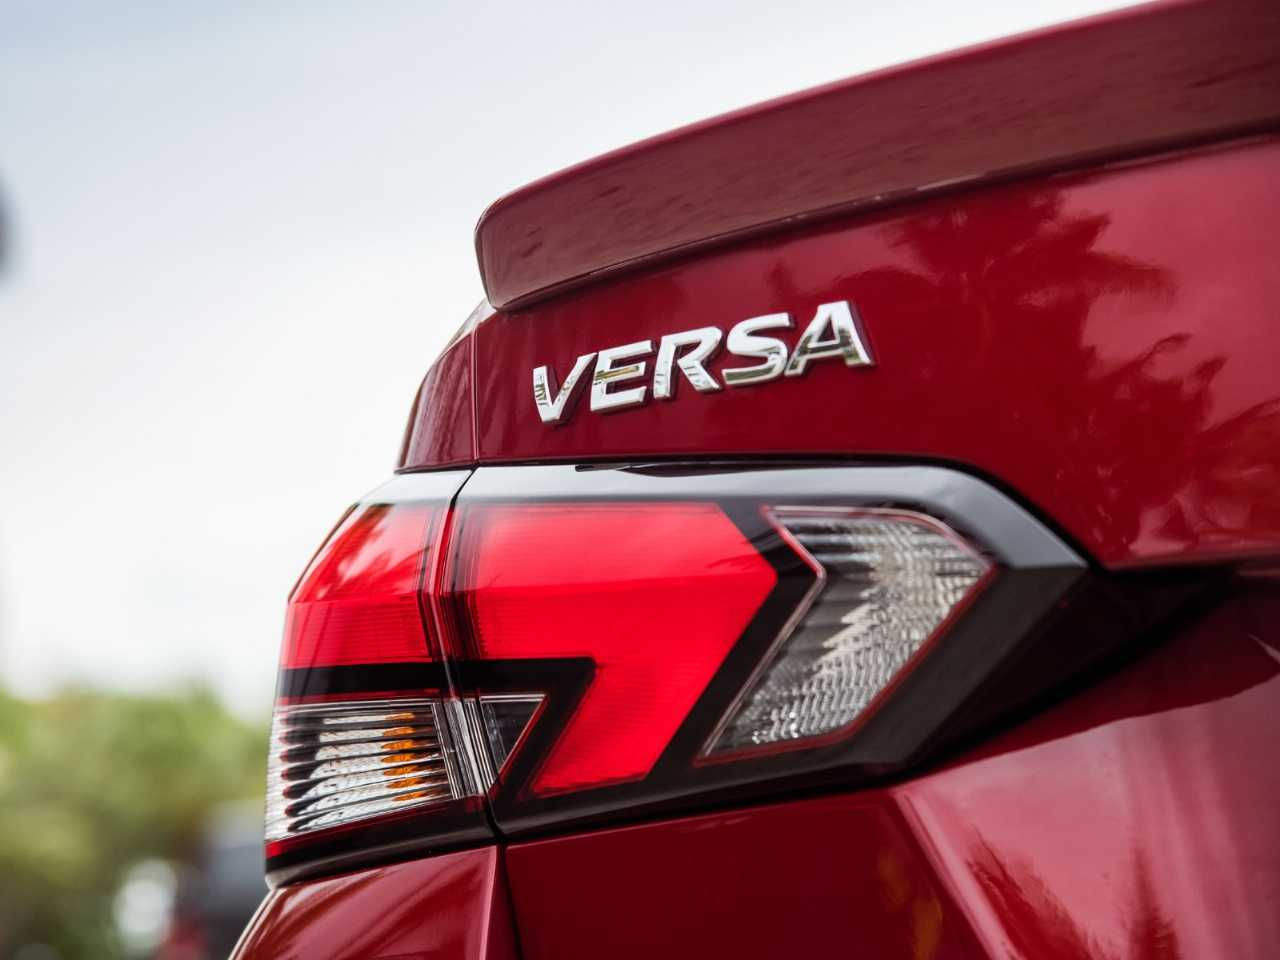 NissanVersa 2020 - lanternas